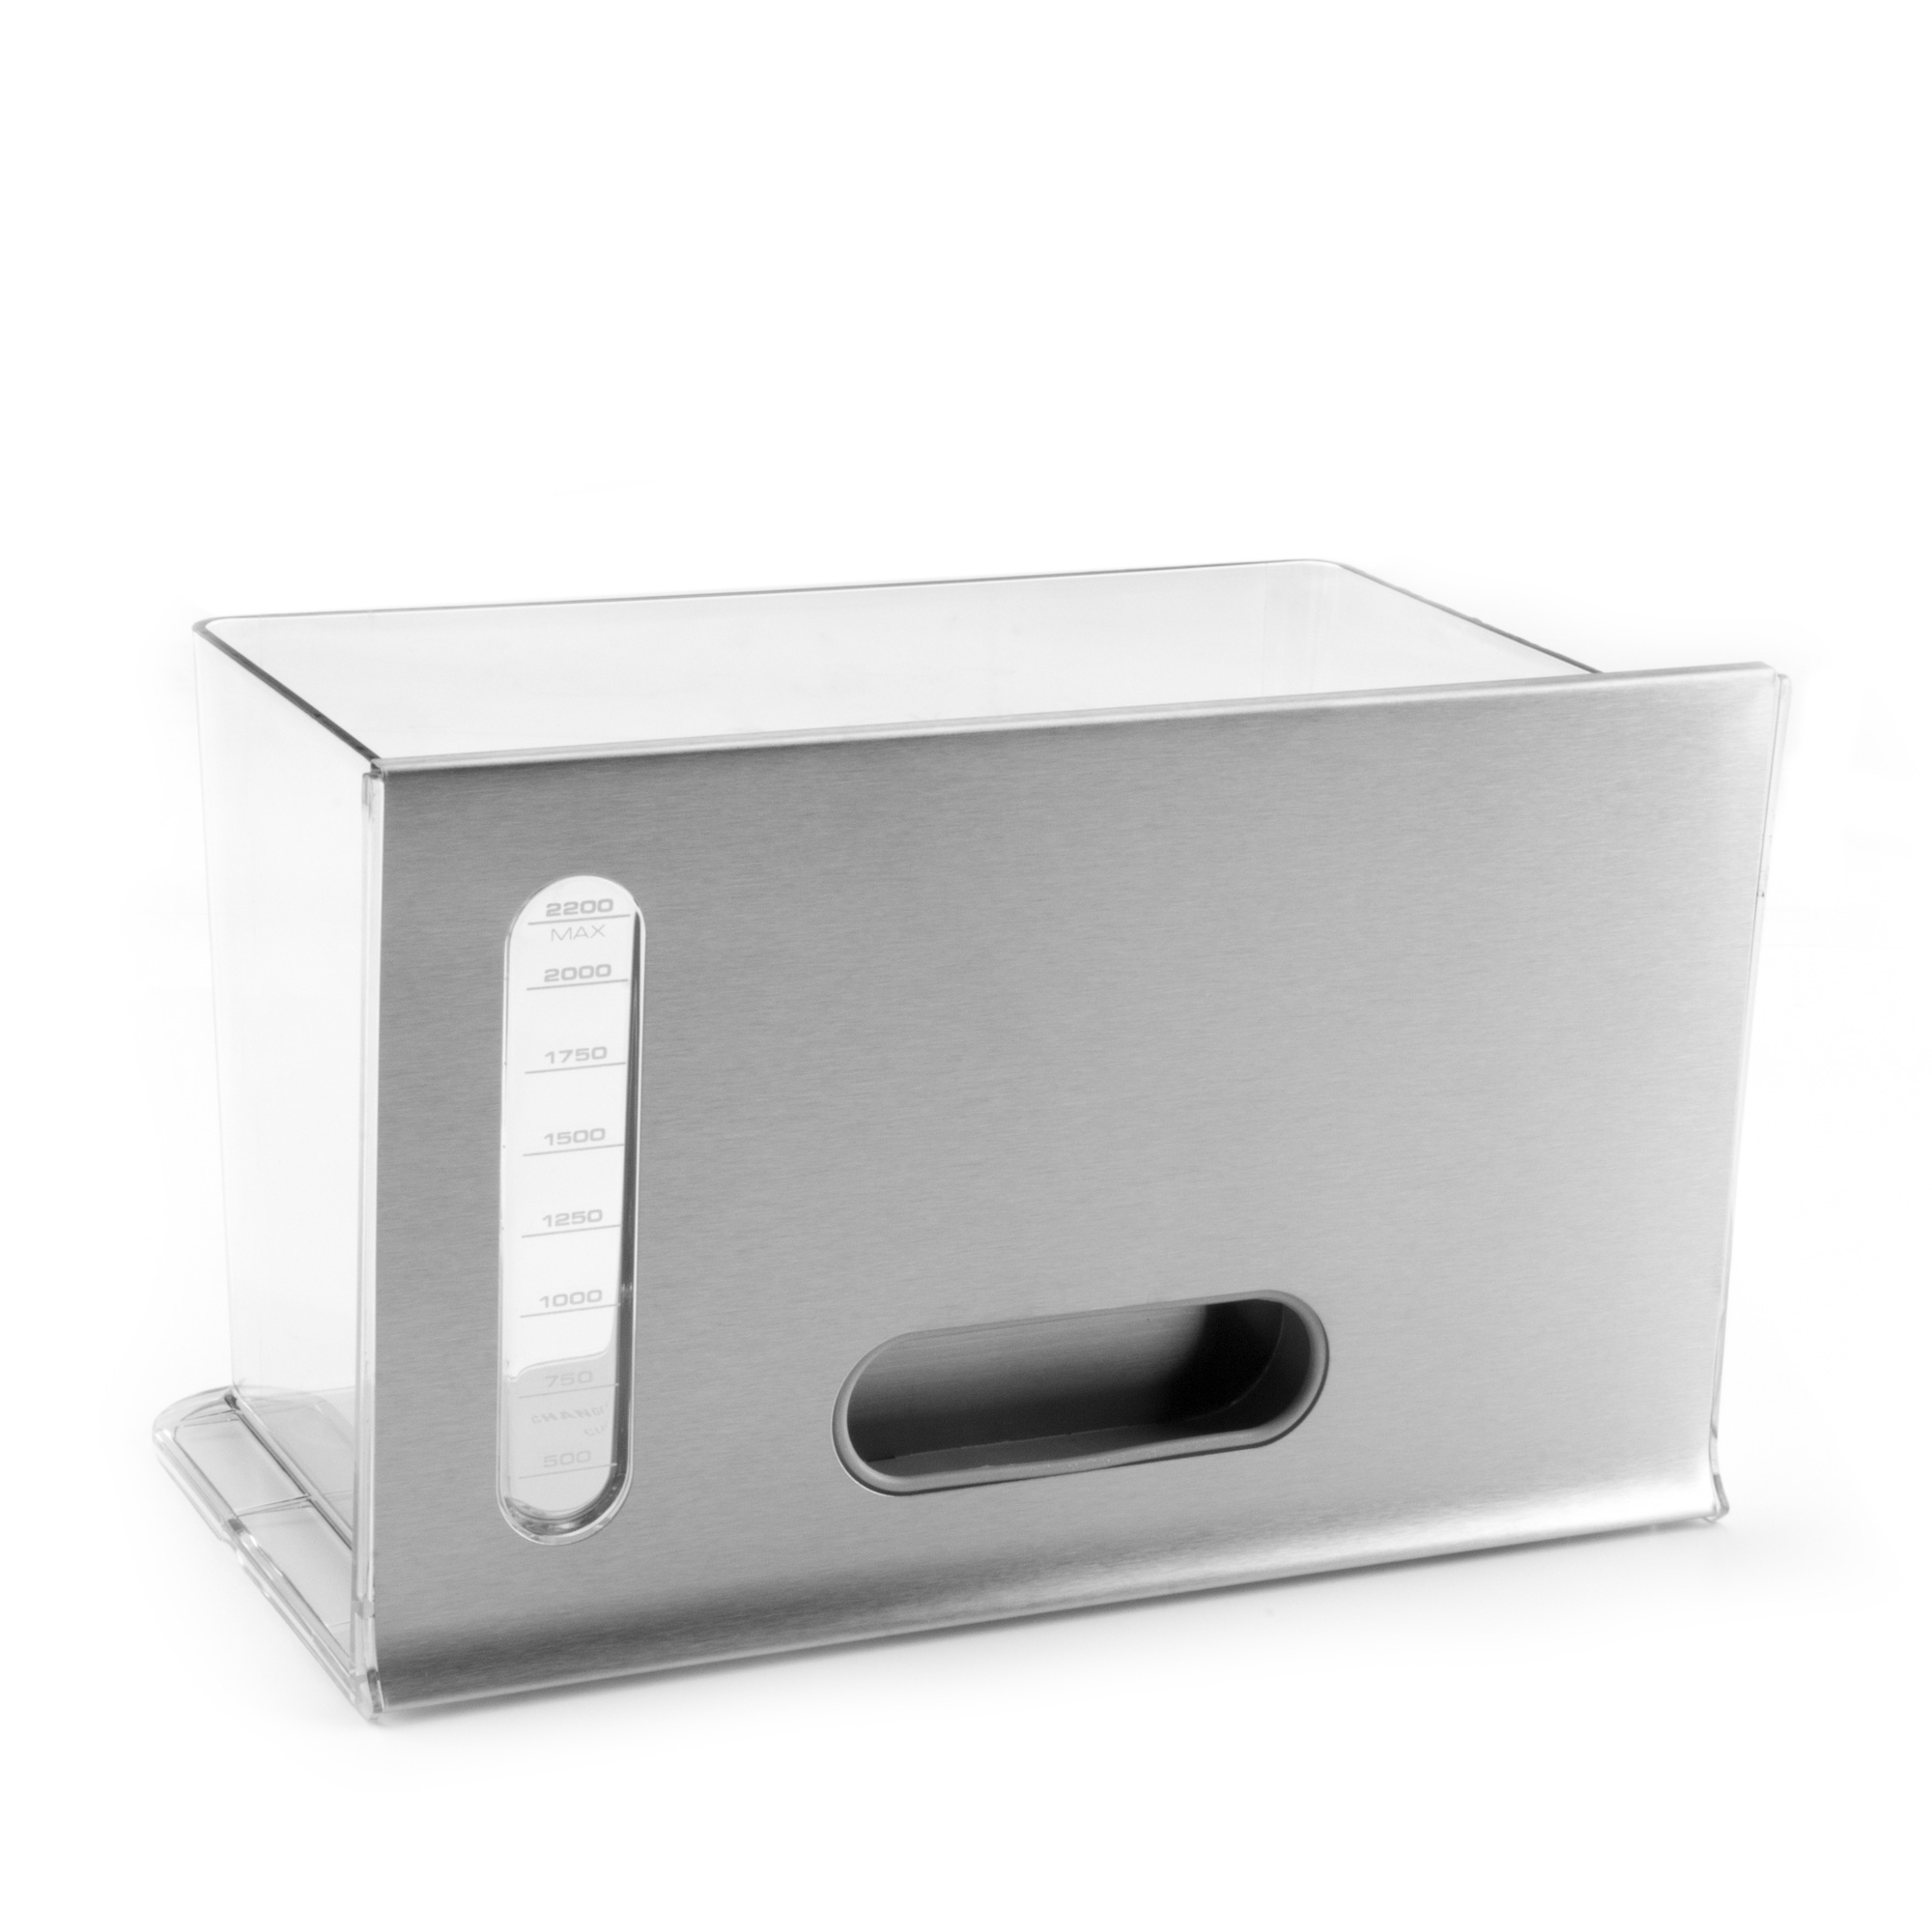 wassertank f r 42609 42610 zubeh r shop kaffee espresso gastroback. Black Bedroom Furniture Sets. Home Design Ideas